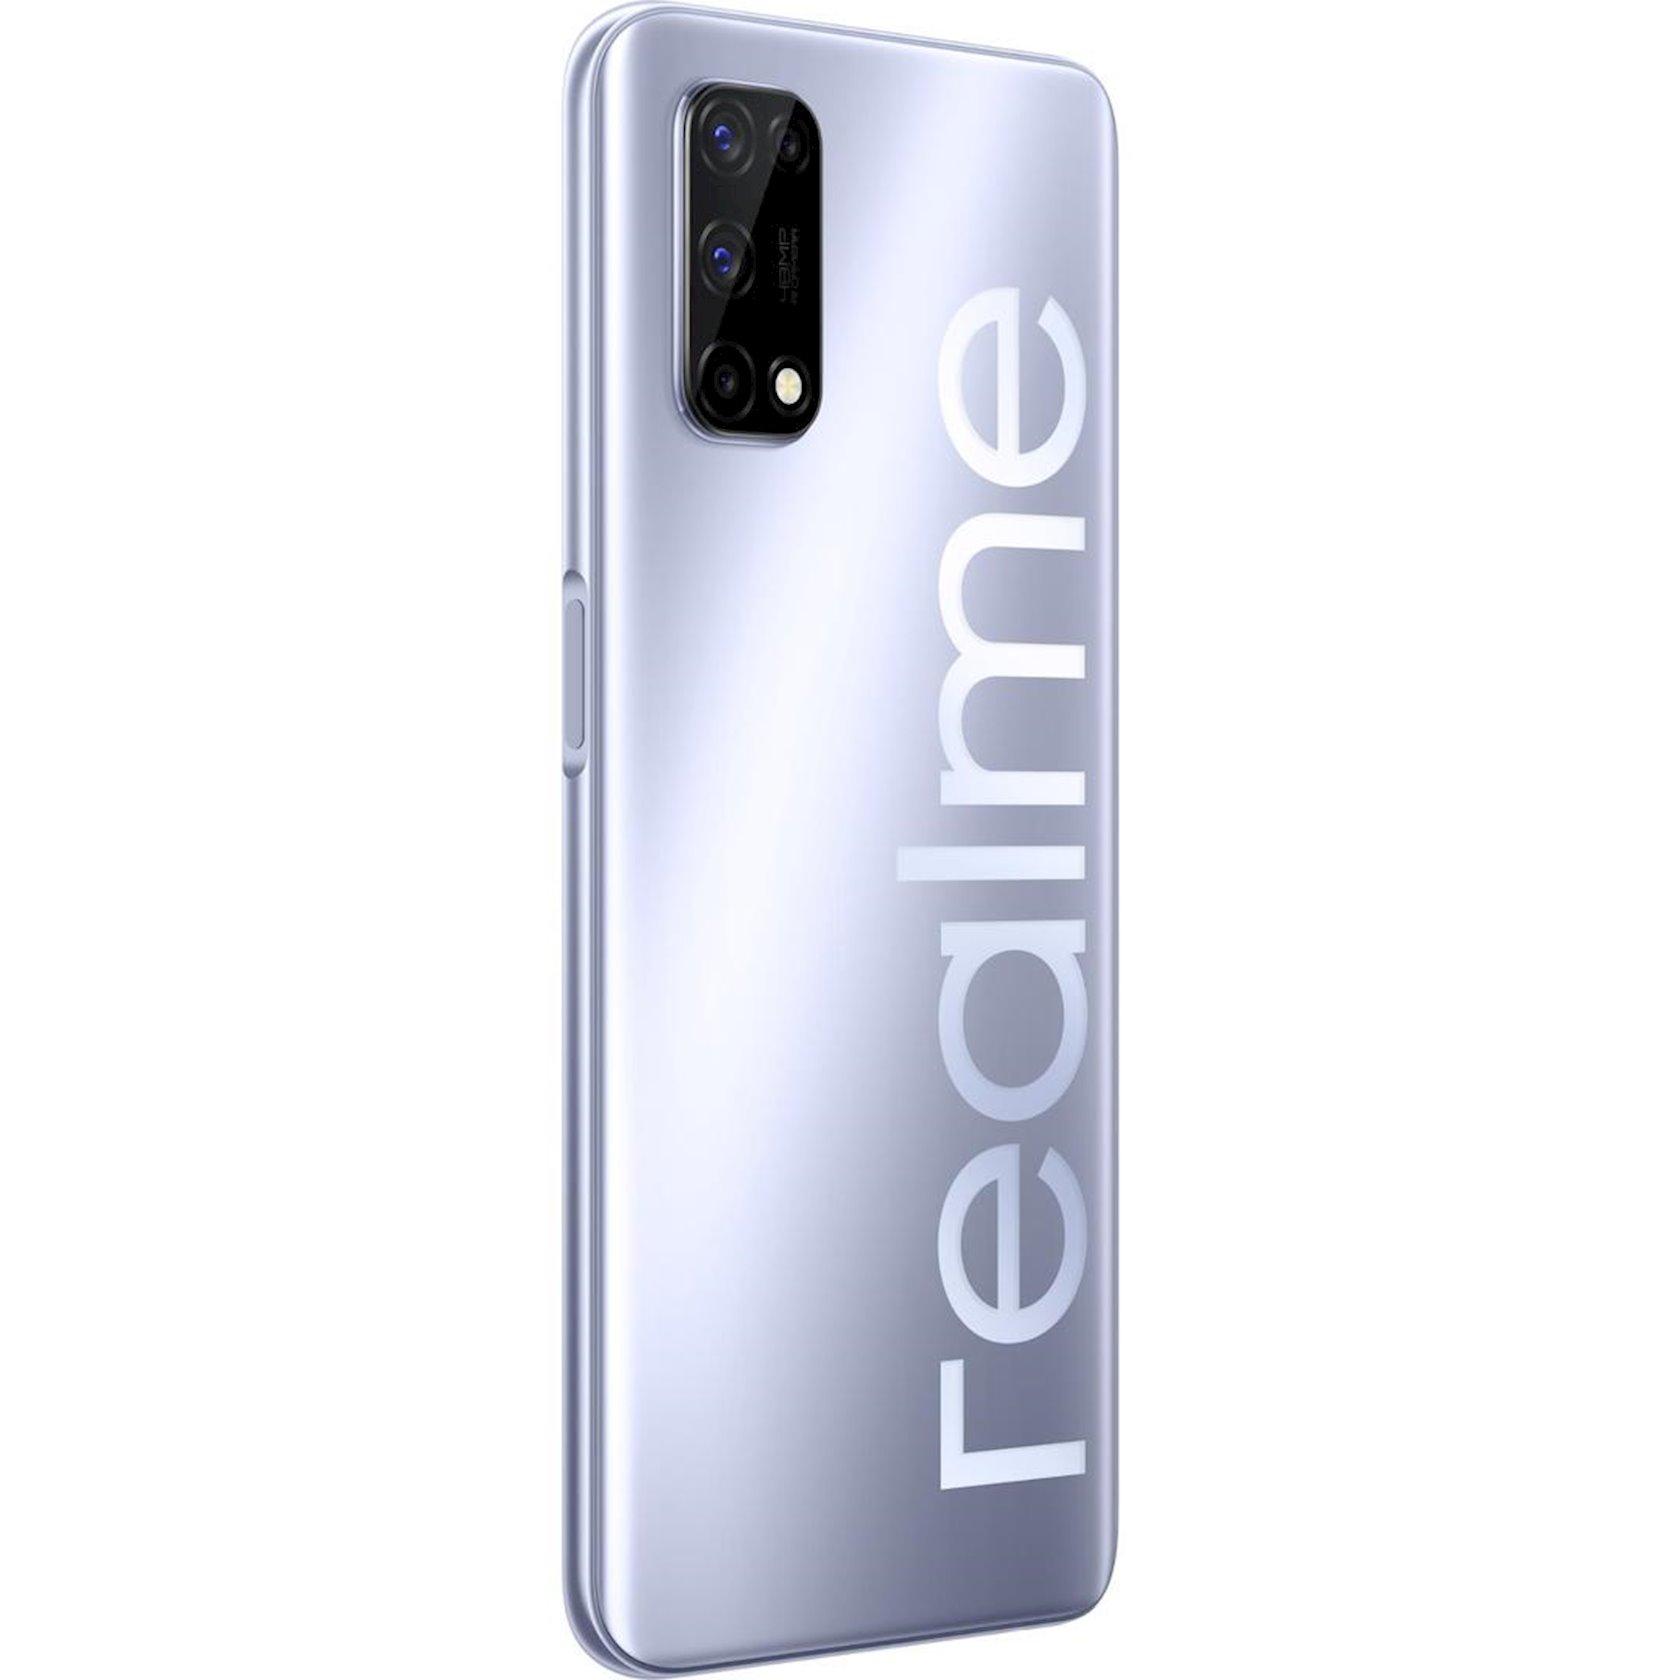 Smartfon Realme 7 5G 6GB/128GB Flash Silver